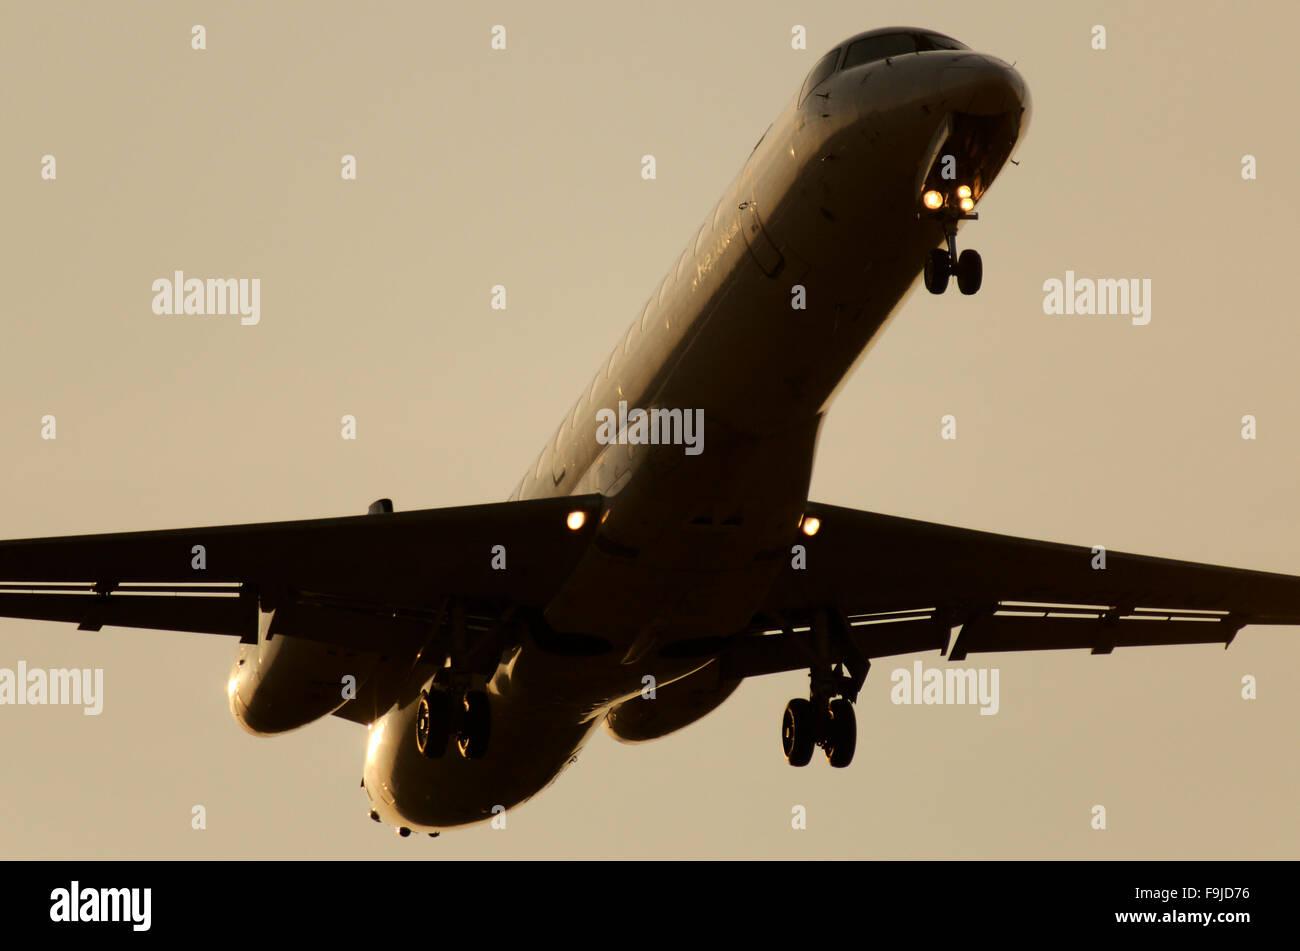 A Silhouette of a Lufthansa Regional Canadair CRJ 701 Landing in Leipzig - Stock Image